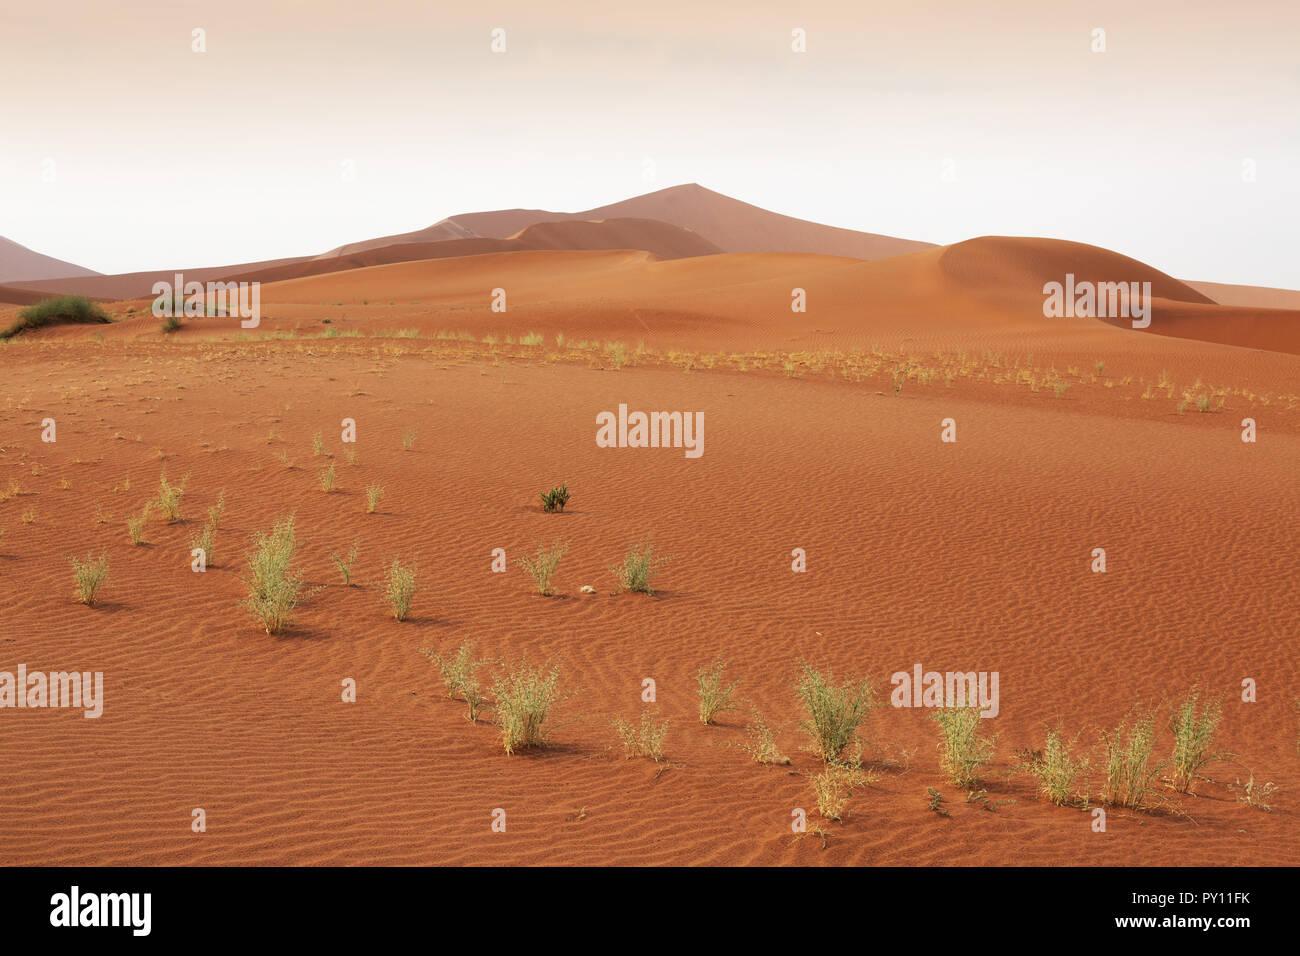 Namibia dunas de arena en el desierto de Namib, en Sossusvlei Namibia África Foto de stock